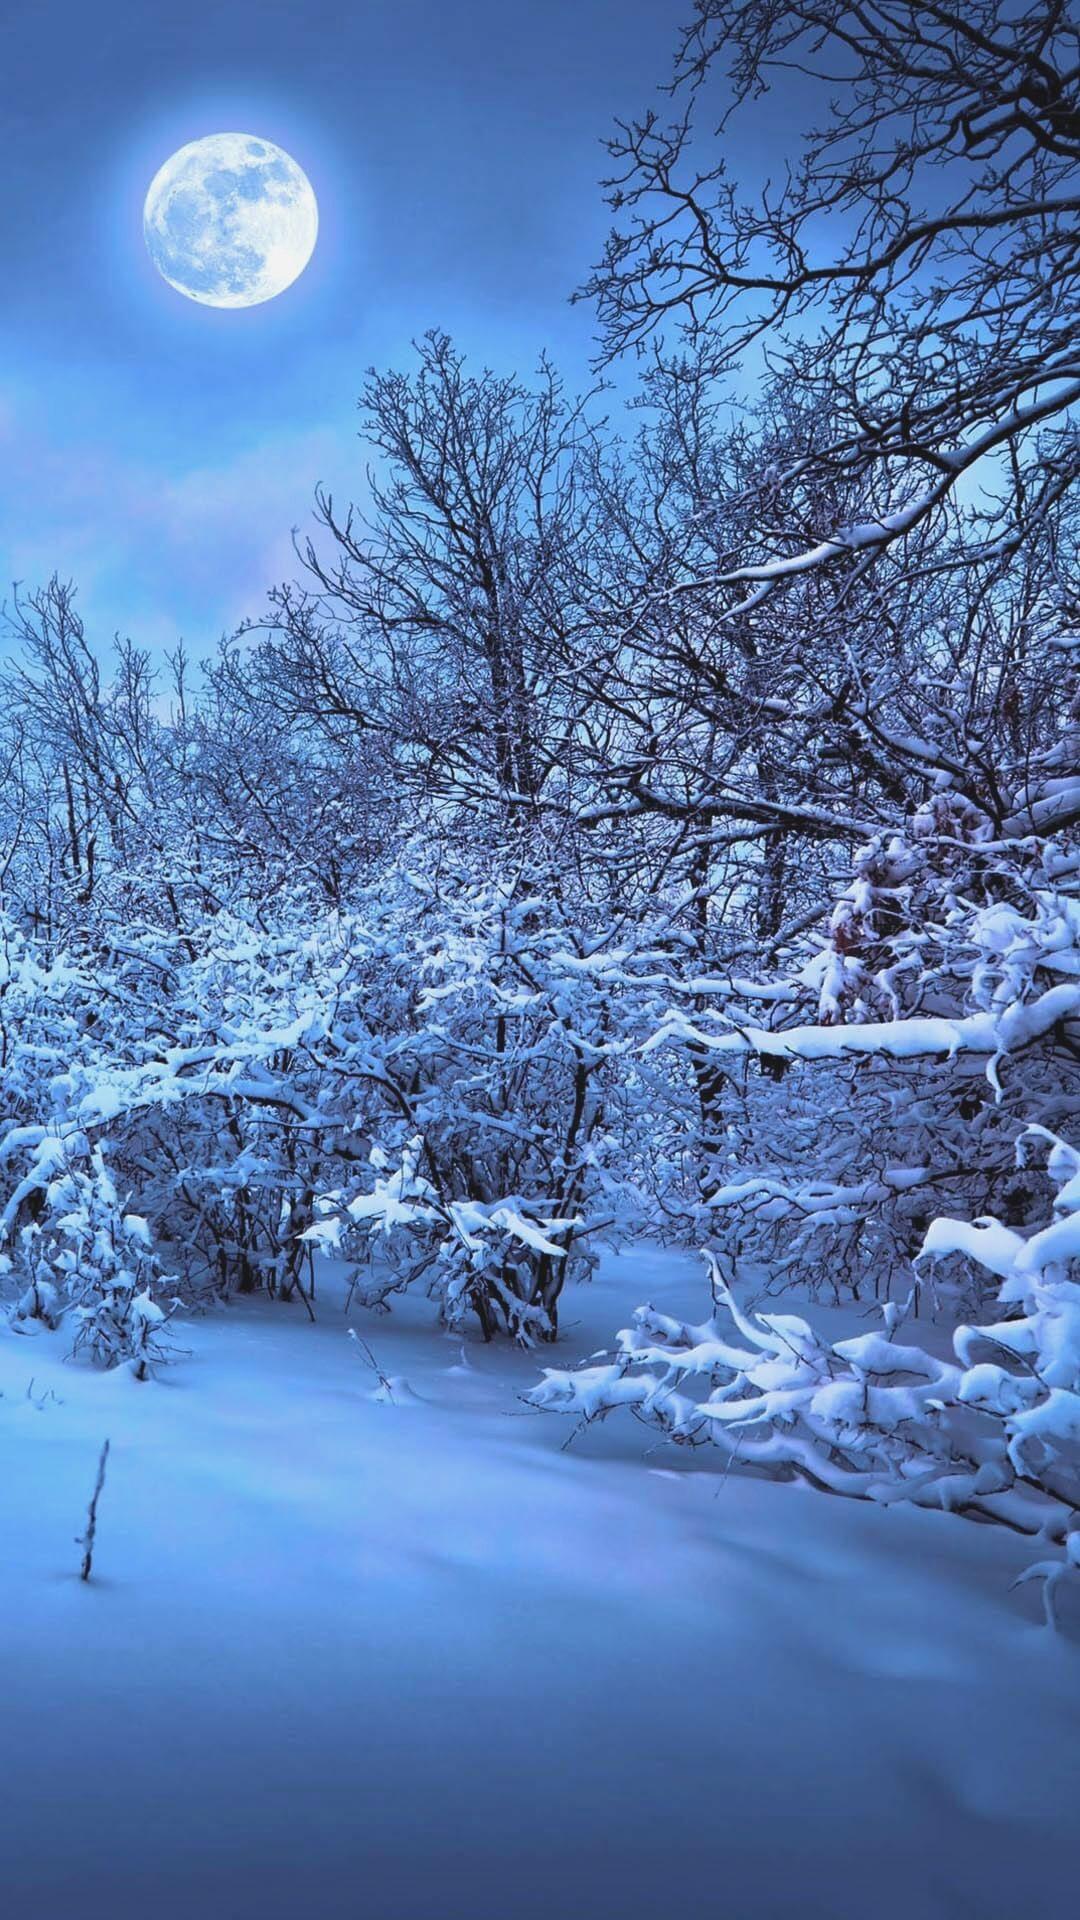 Winter Wallpaper For Iphone 6 Best Iphone Wallpaper Pictures 1080x1920